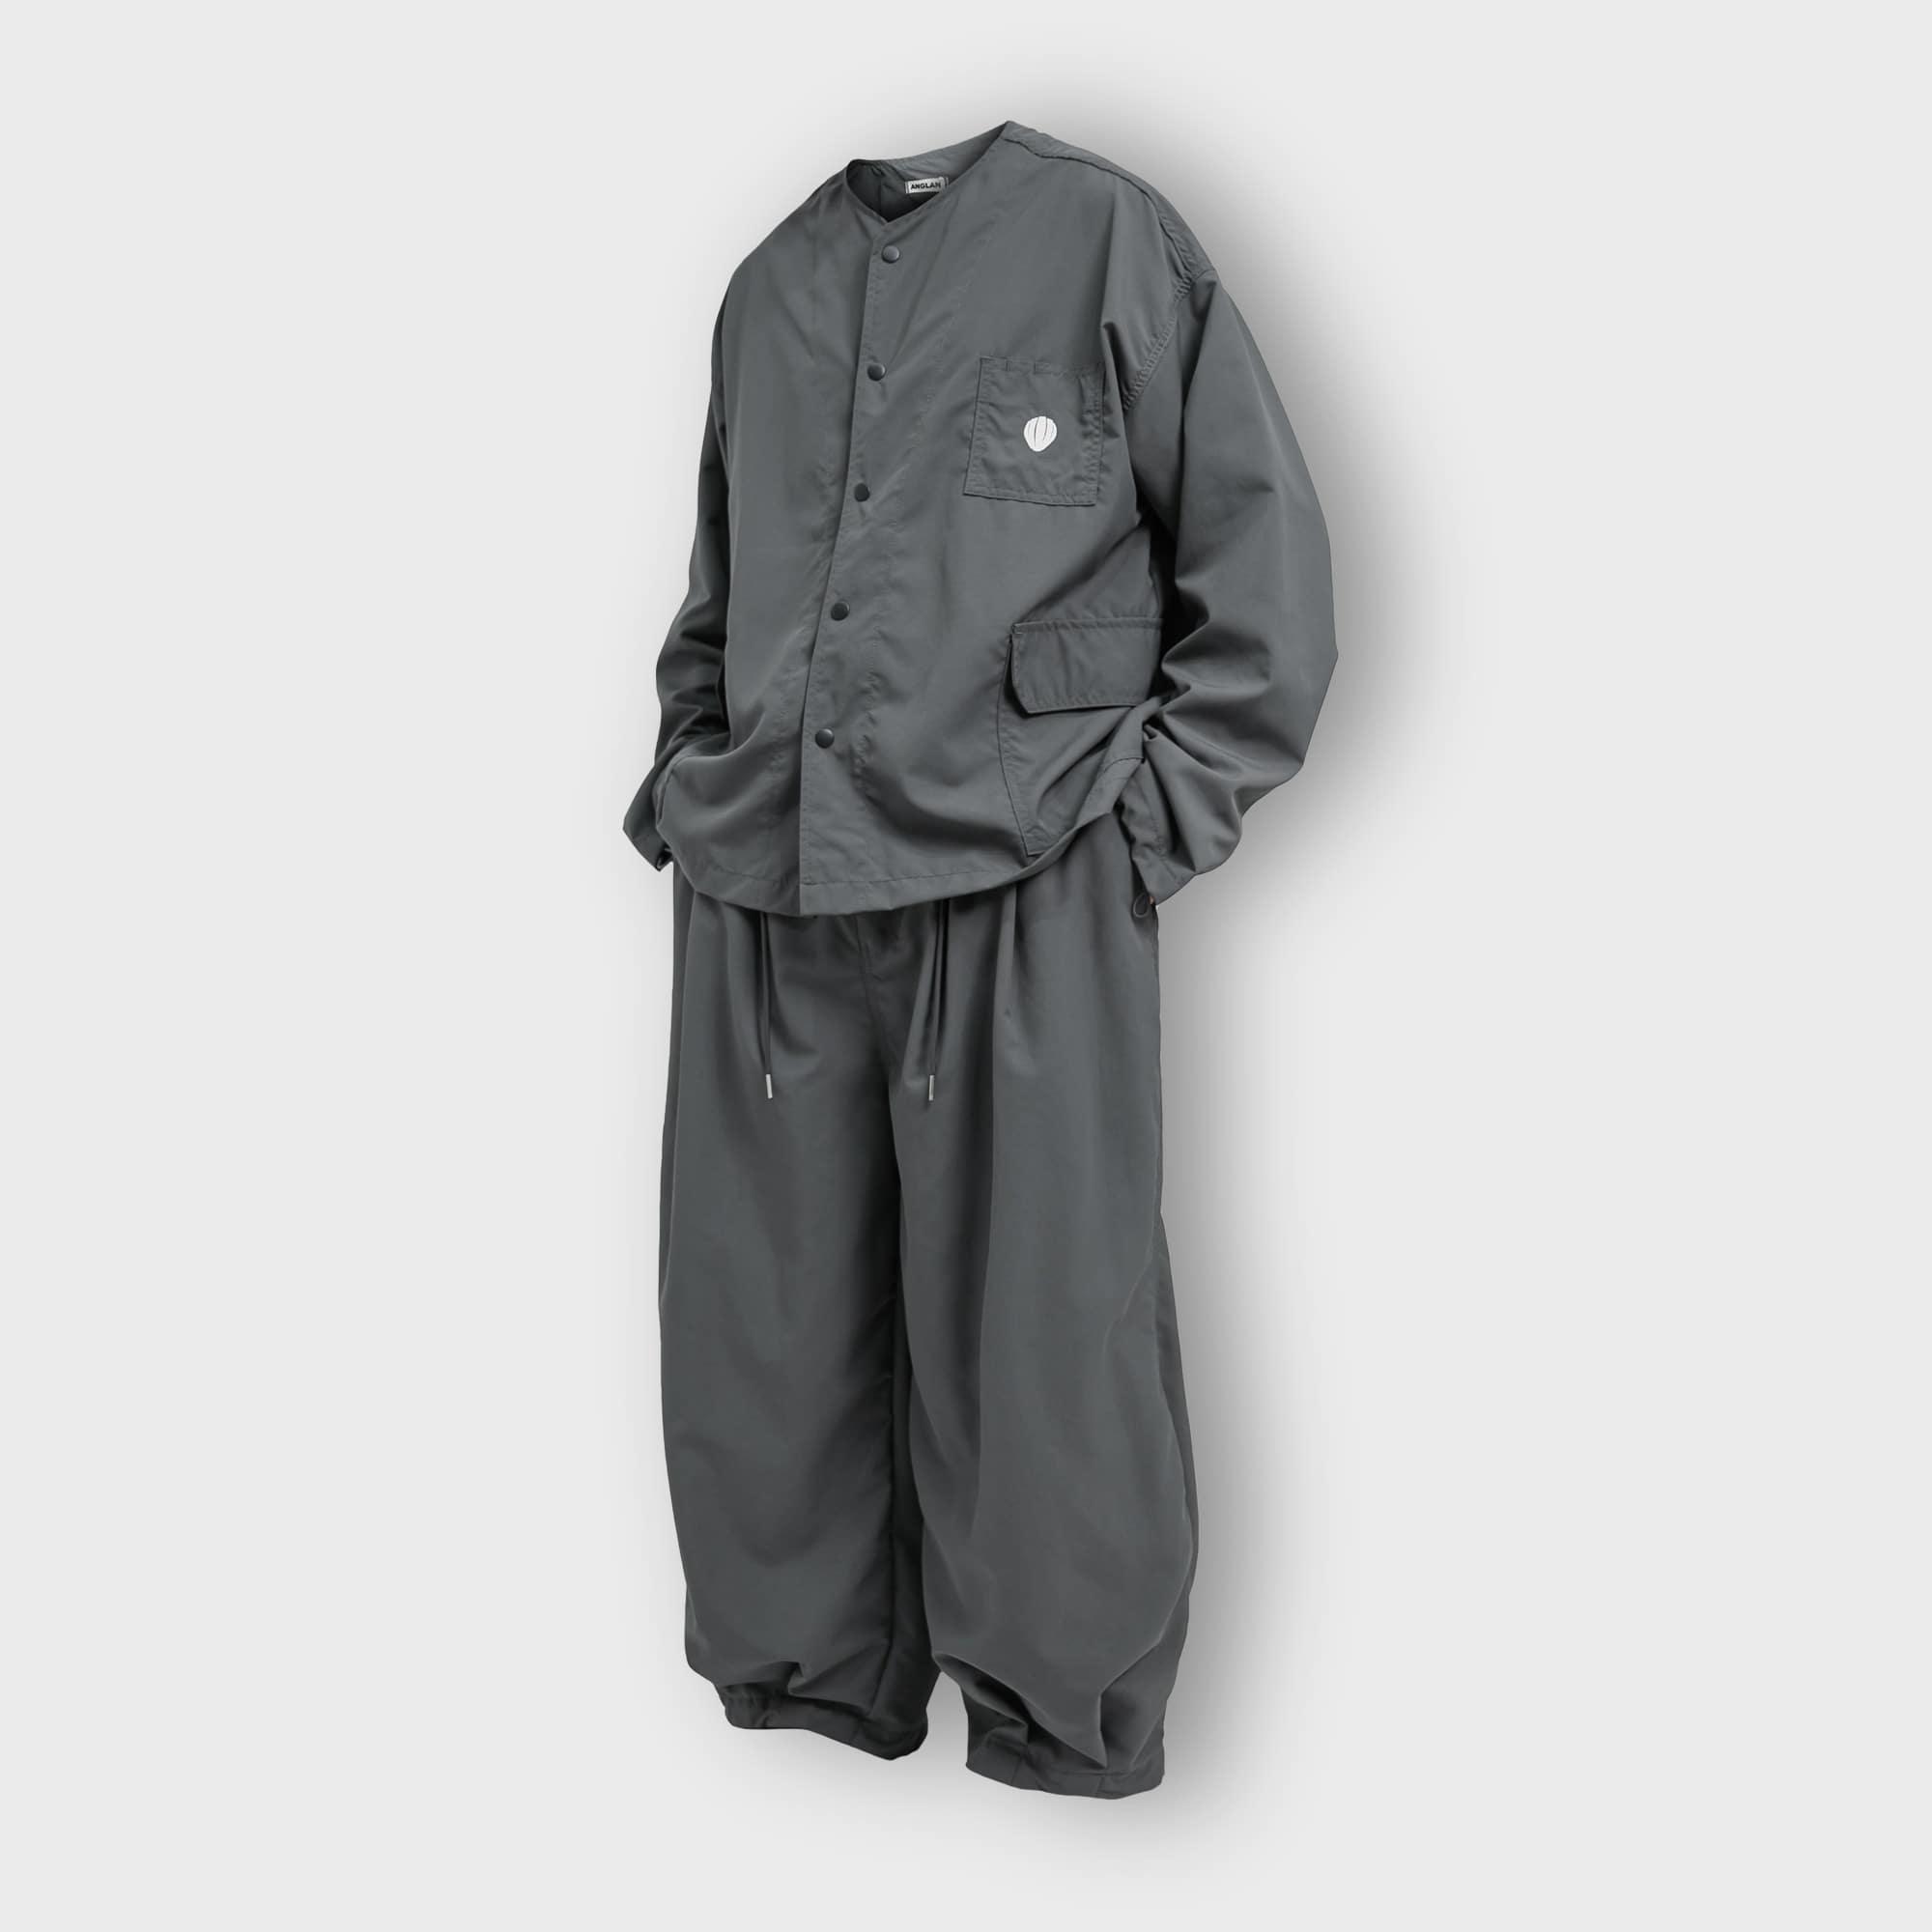 [AG] Rib Nylon Public Set up - Grey